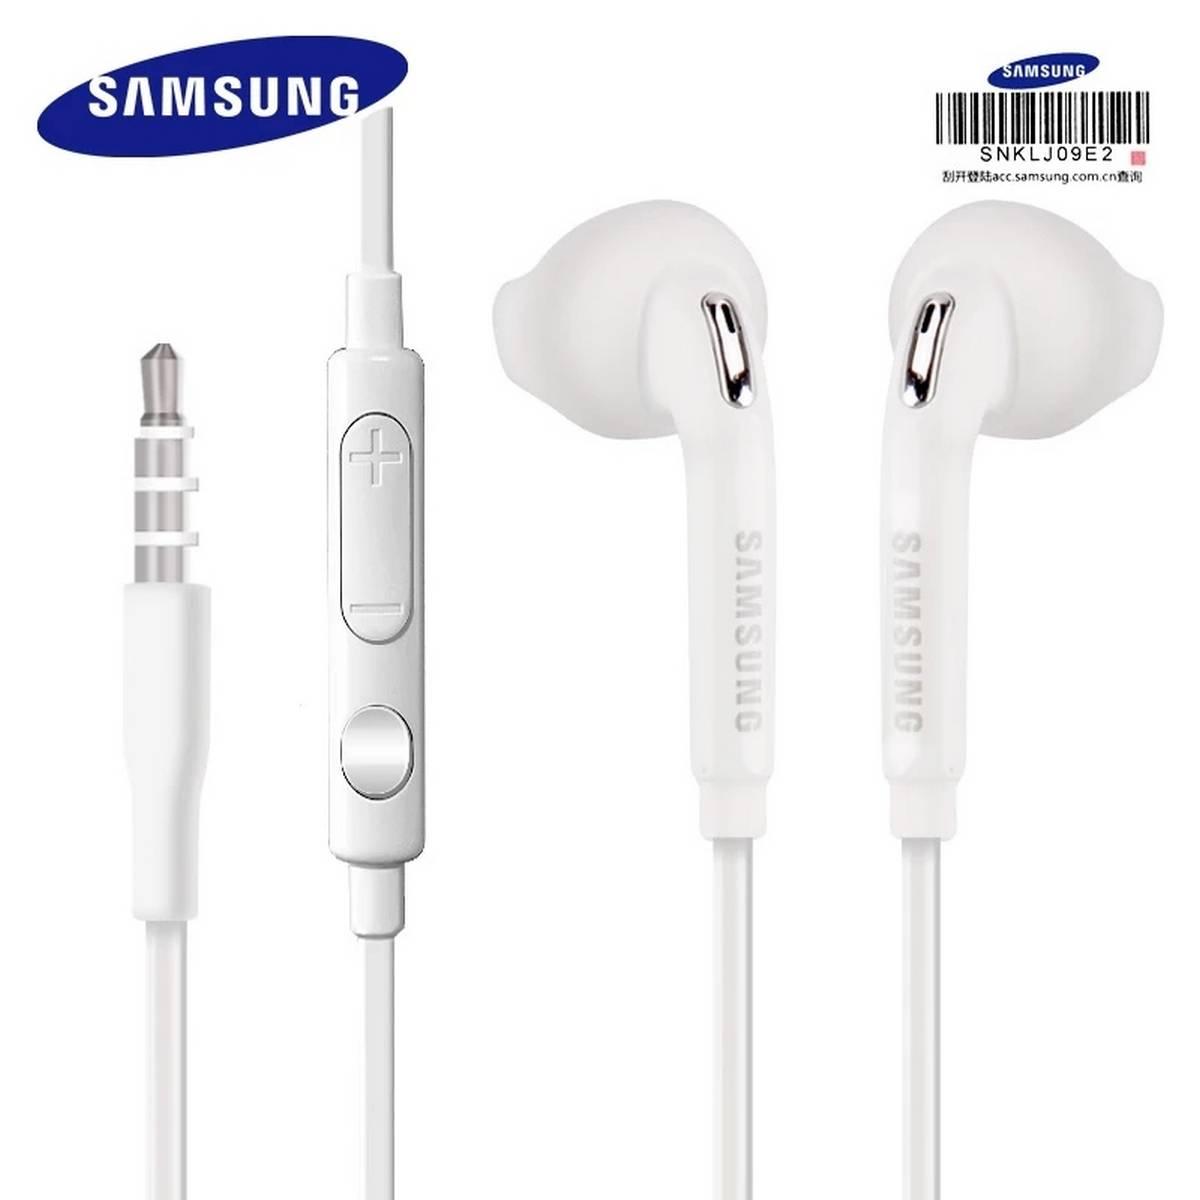 100% Original Samsung handfree EO-EG920 Earphone In-ear With control Speaker Wired 3.5mm headsets With Mic 1.2m In-ear Sport Earphones